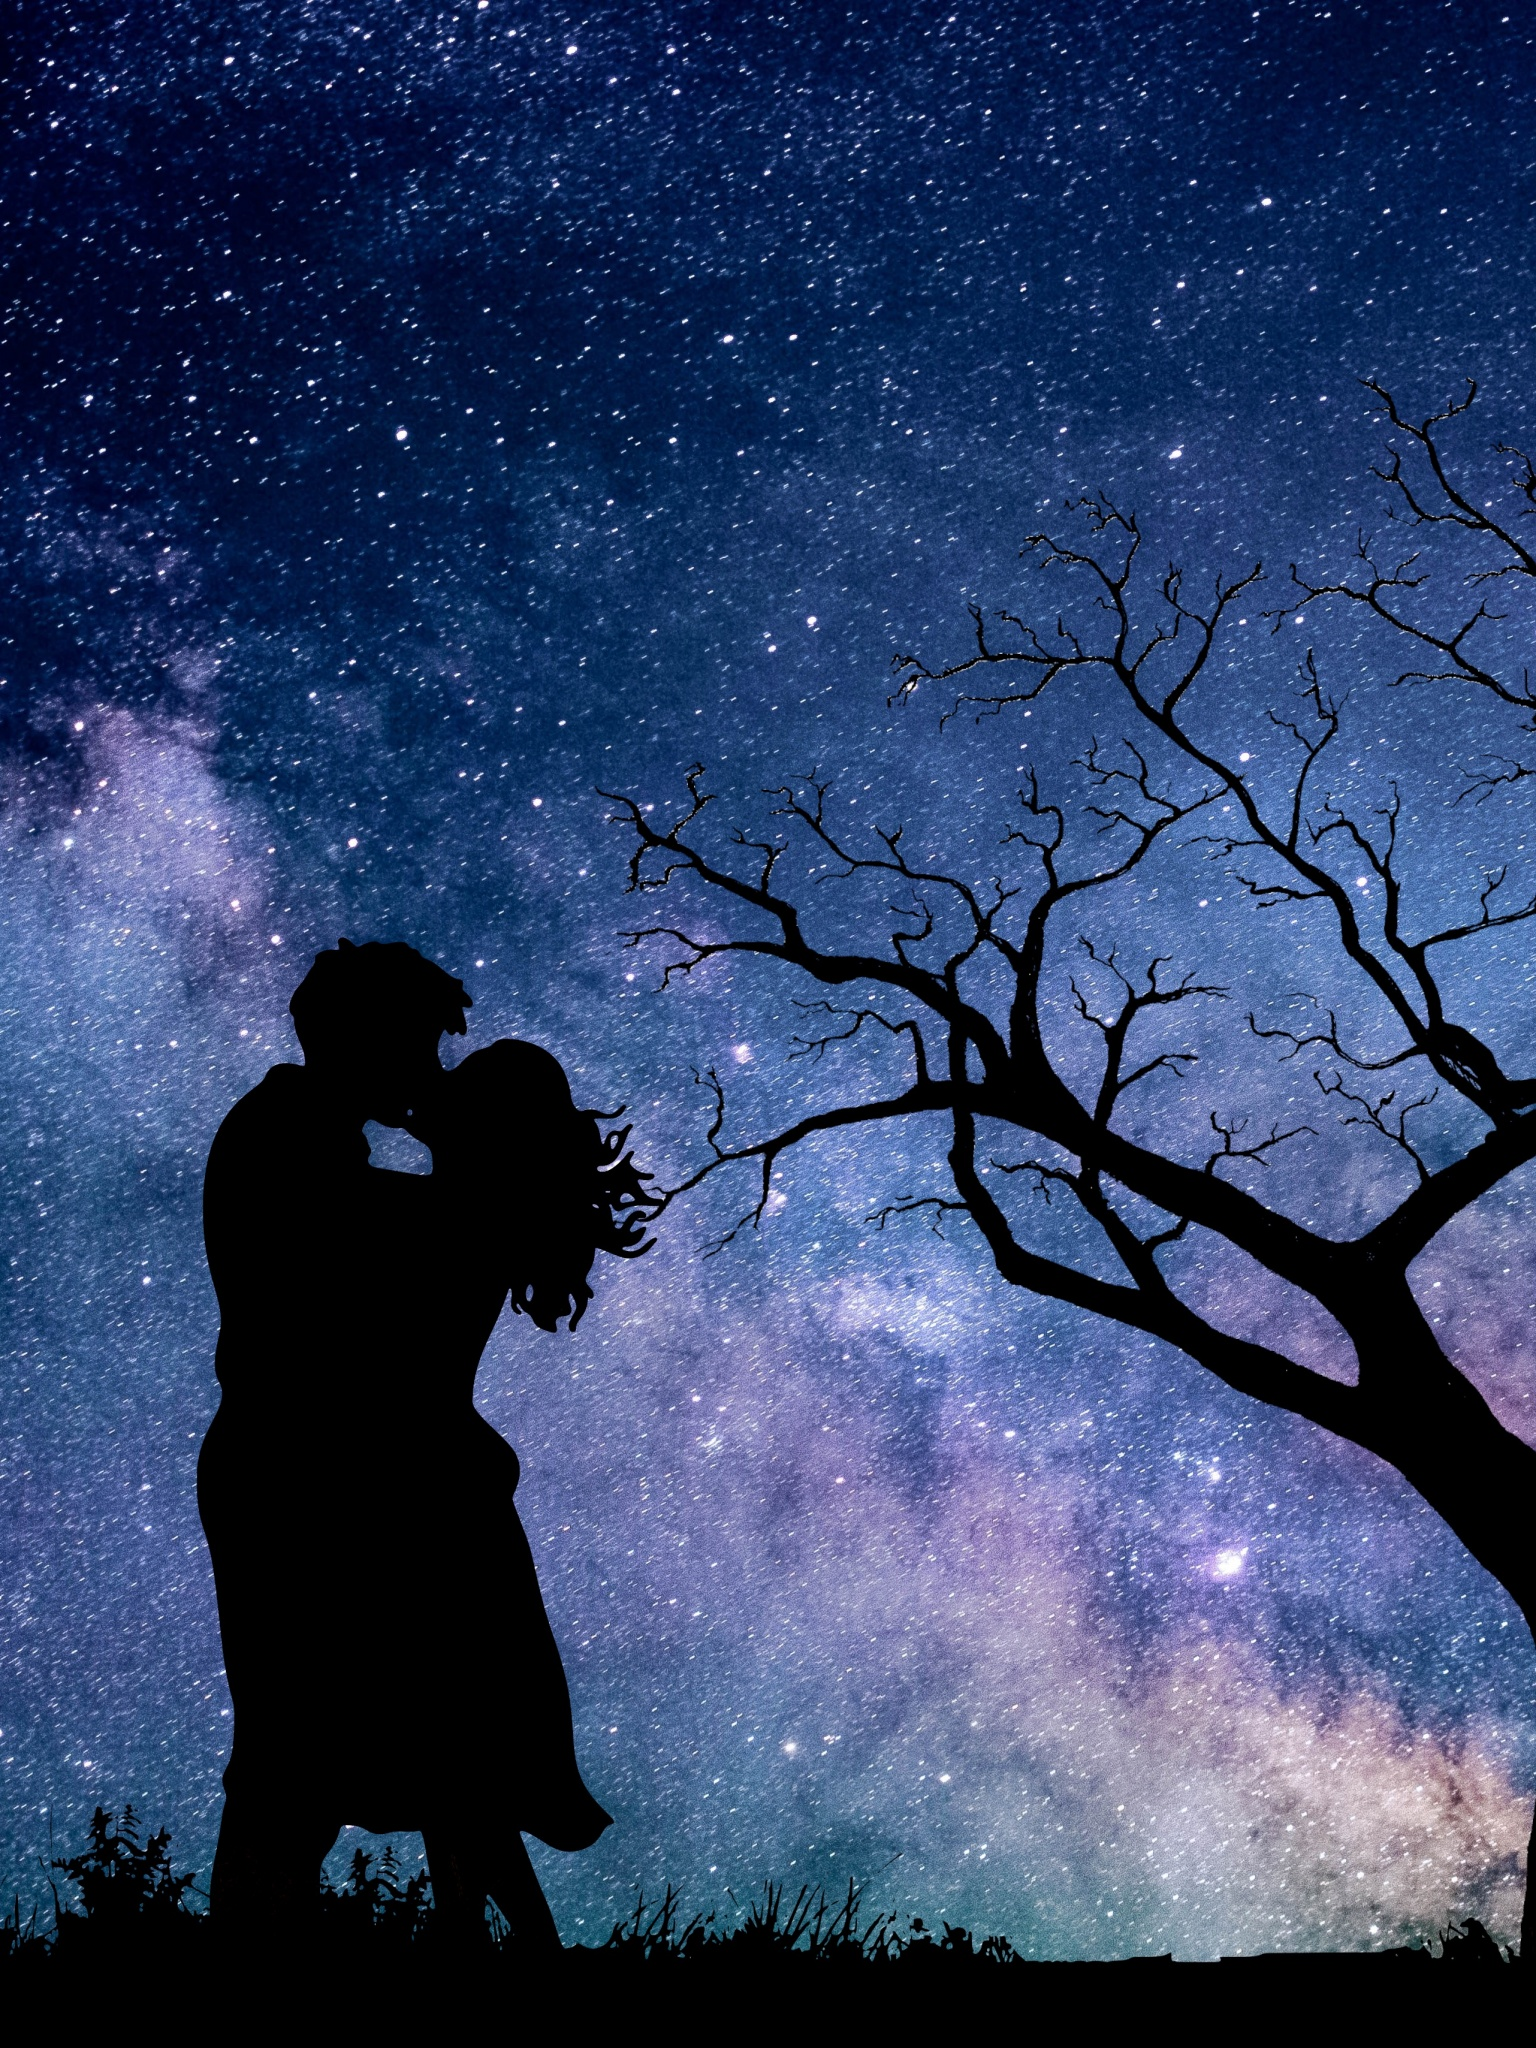 couple starry sky 1671 5k romantic kiss silhouette mobiles tablets resolutions ipad desktop iphone